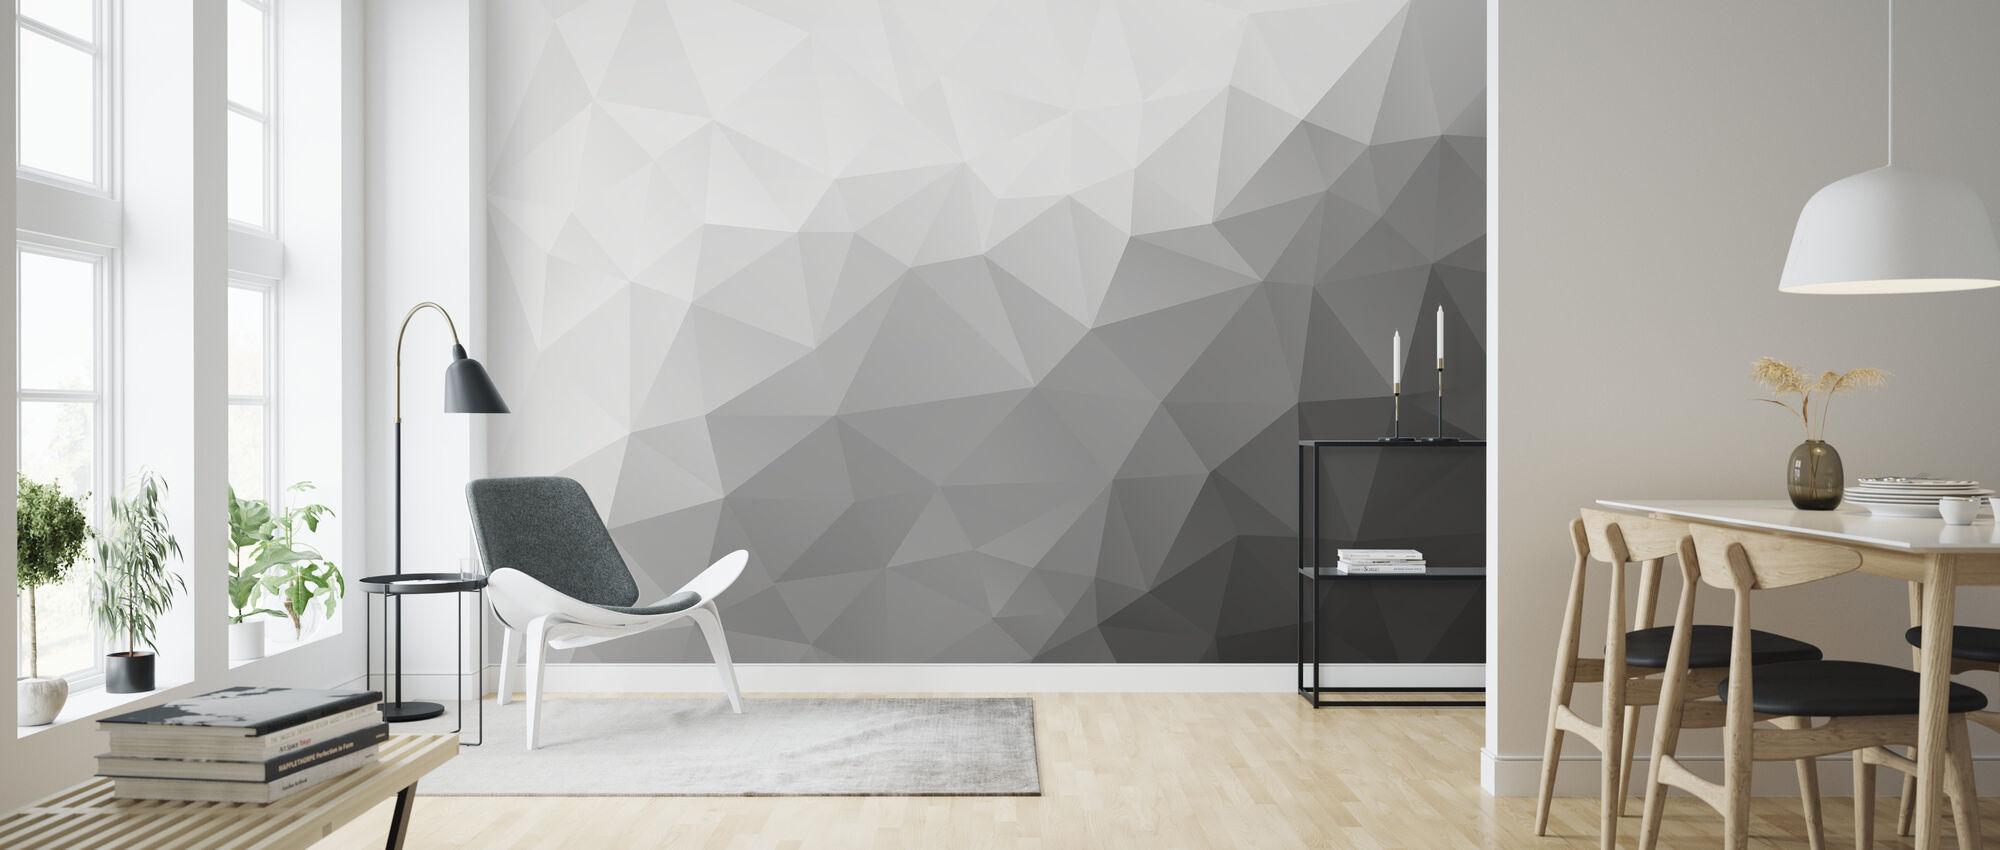 Polygonal Grey Shades 2 - Wallpaper - Living Room